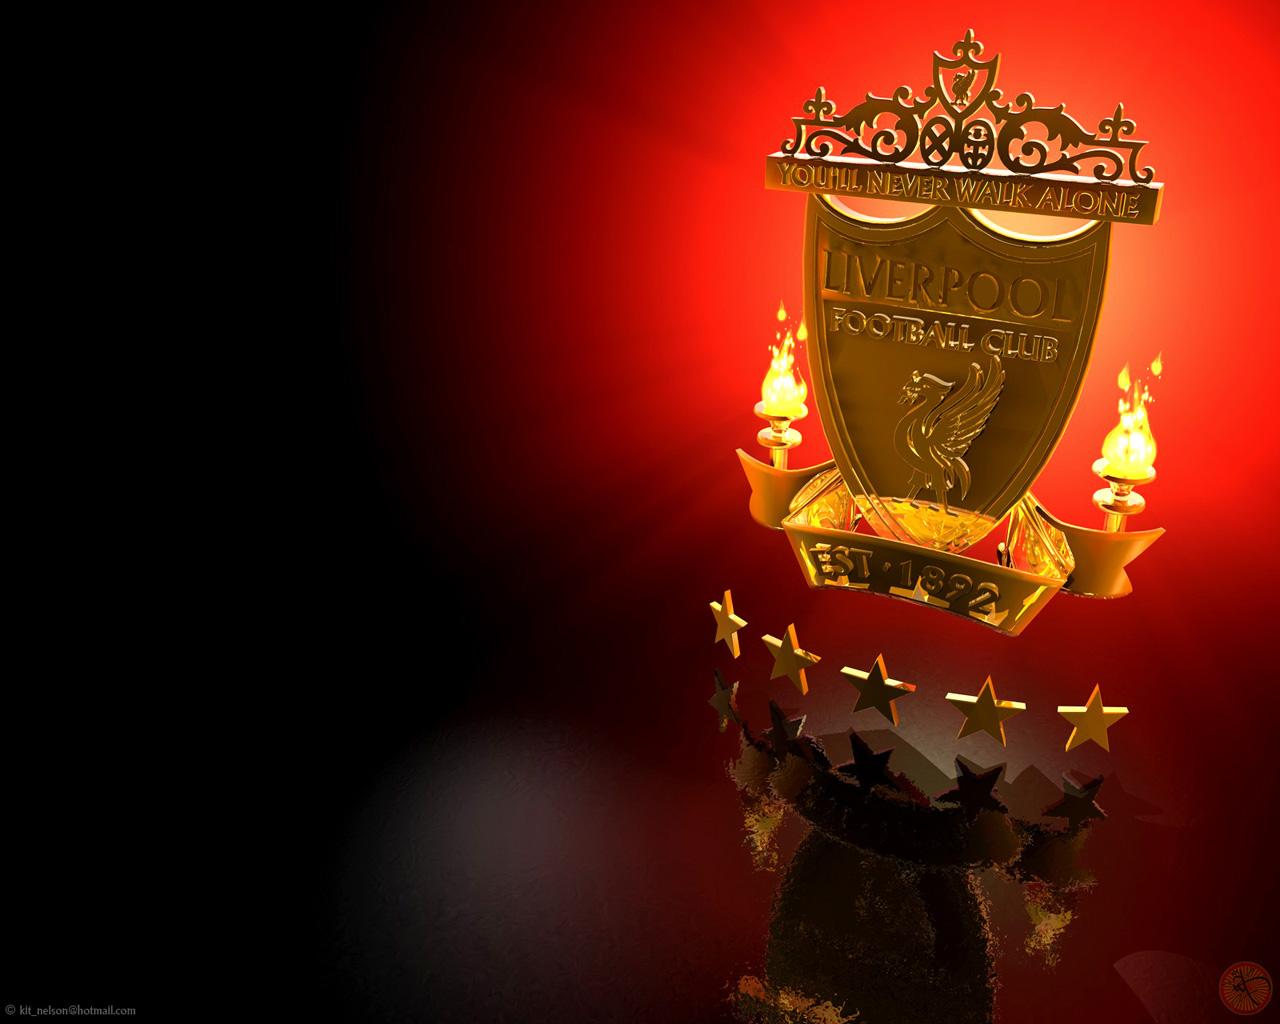 http://4.bp.blogspot.com/-NesDLT2thHg/T5ExpCYUmsI/AAAAAAAAGb8/VCpxUlHF-2o/s1600/gold_liverpool_wallpaper-792746.jpg